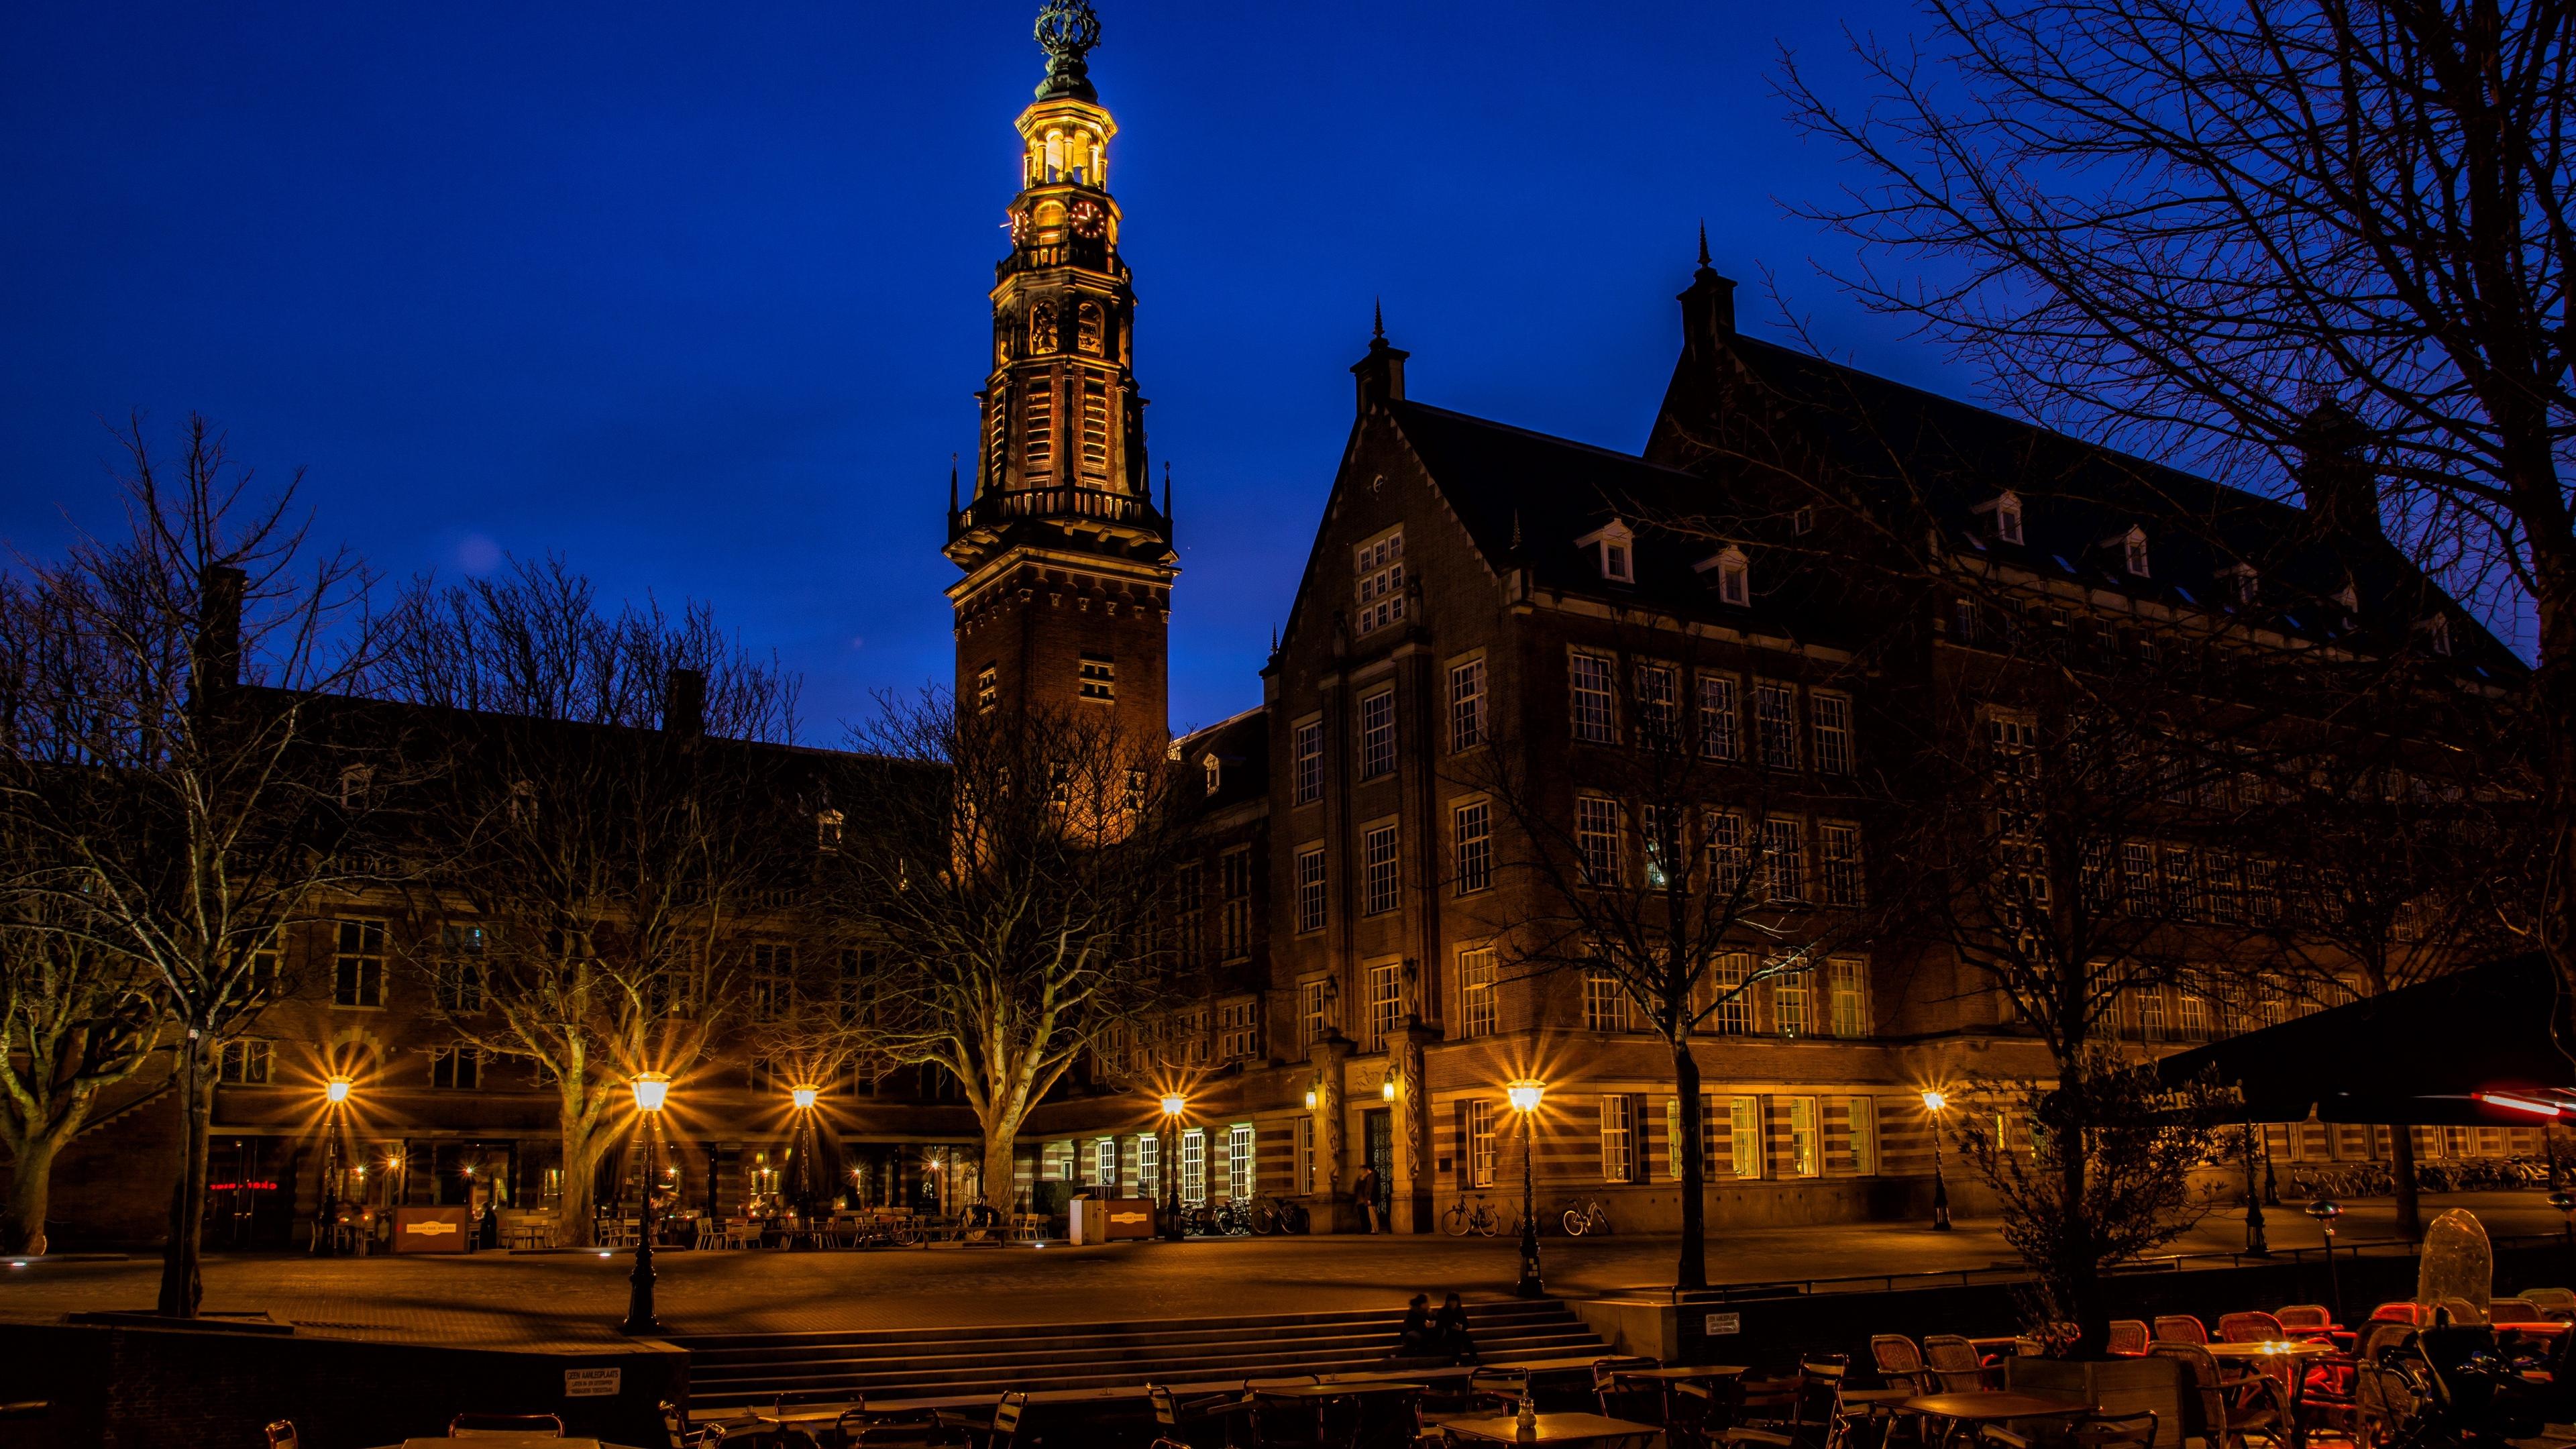 holland night building street 4k 1538067123 - holland, night, building, street 4k - Night, Holland, Building